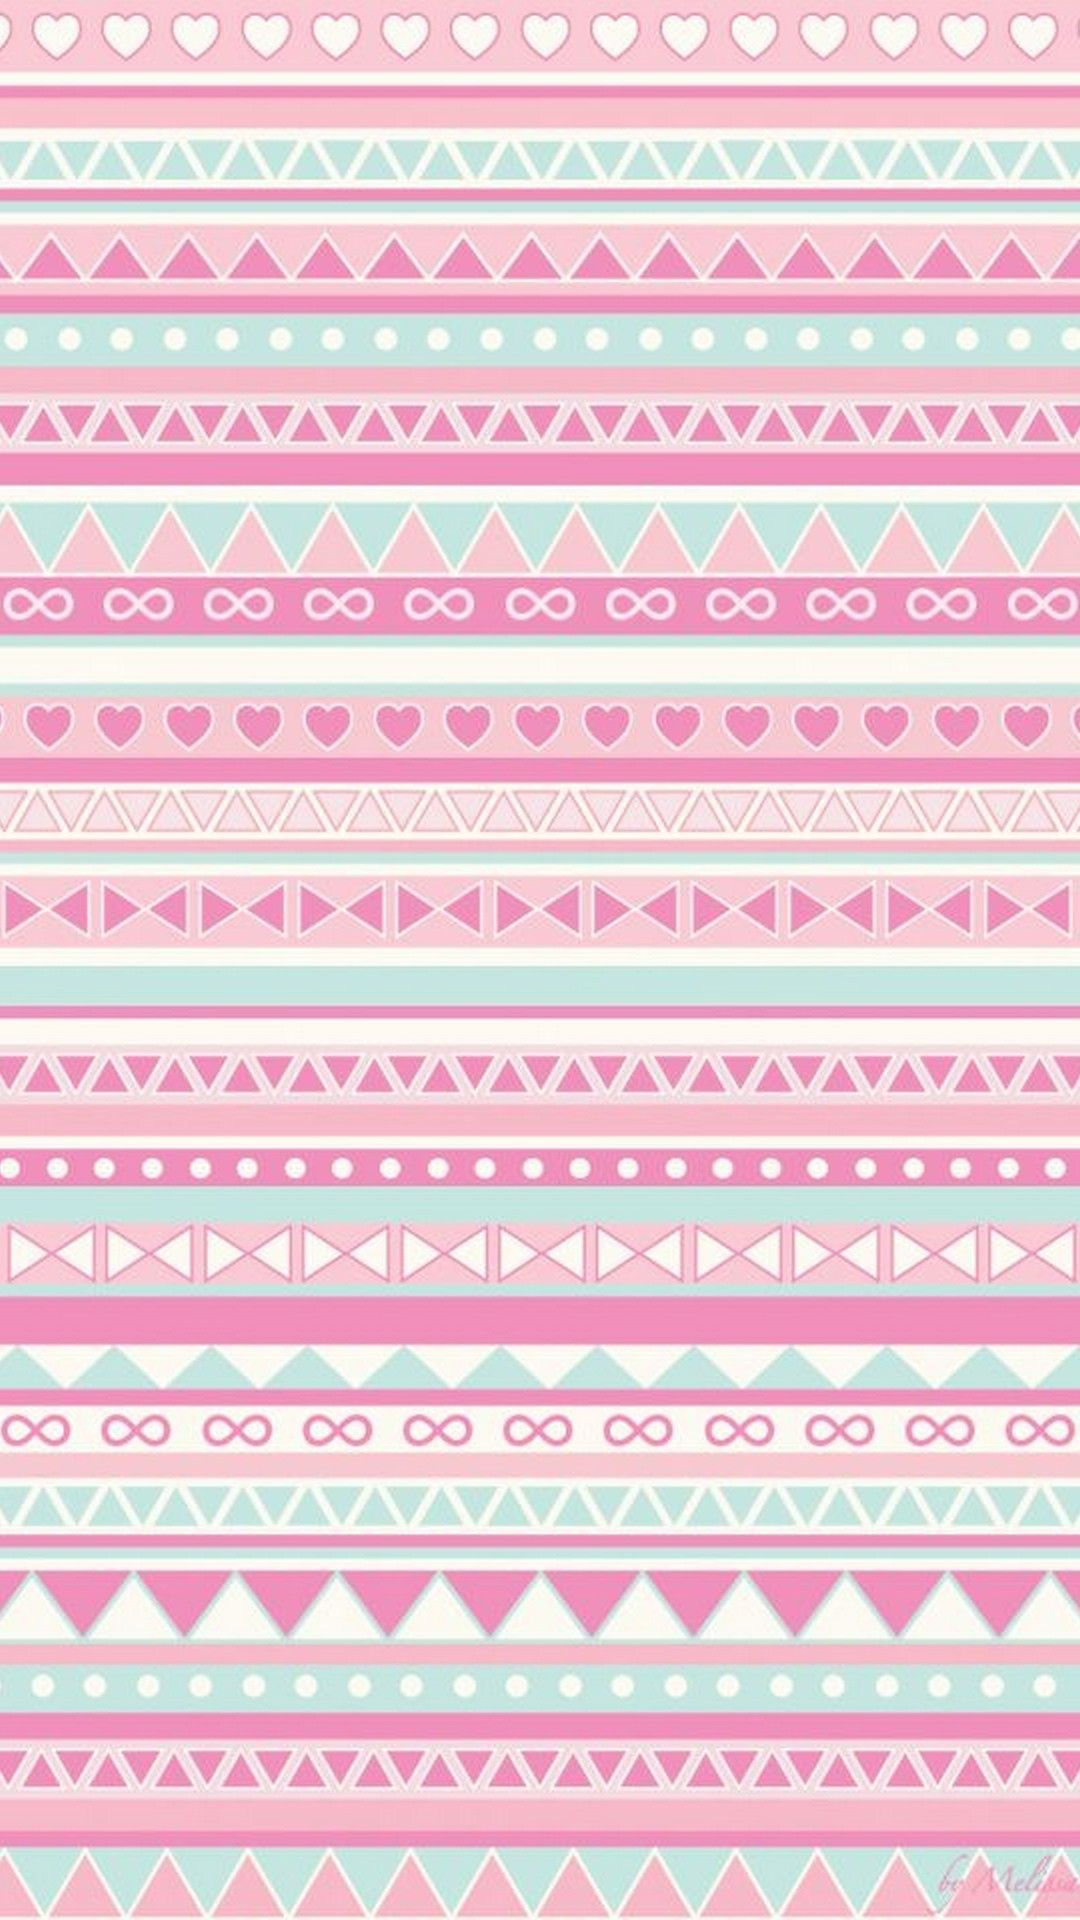 Cute Stickers I Phones Wallpaper Best Phone Wallpaper Aztec Wallpaper Tribal Wallpaper Wallpaper Cute Girly Cute cellphone wallpaper images